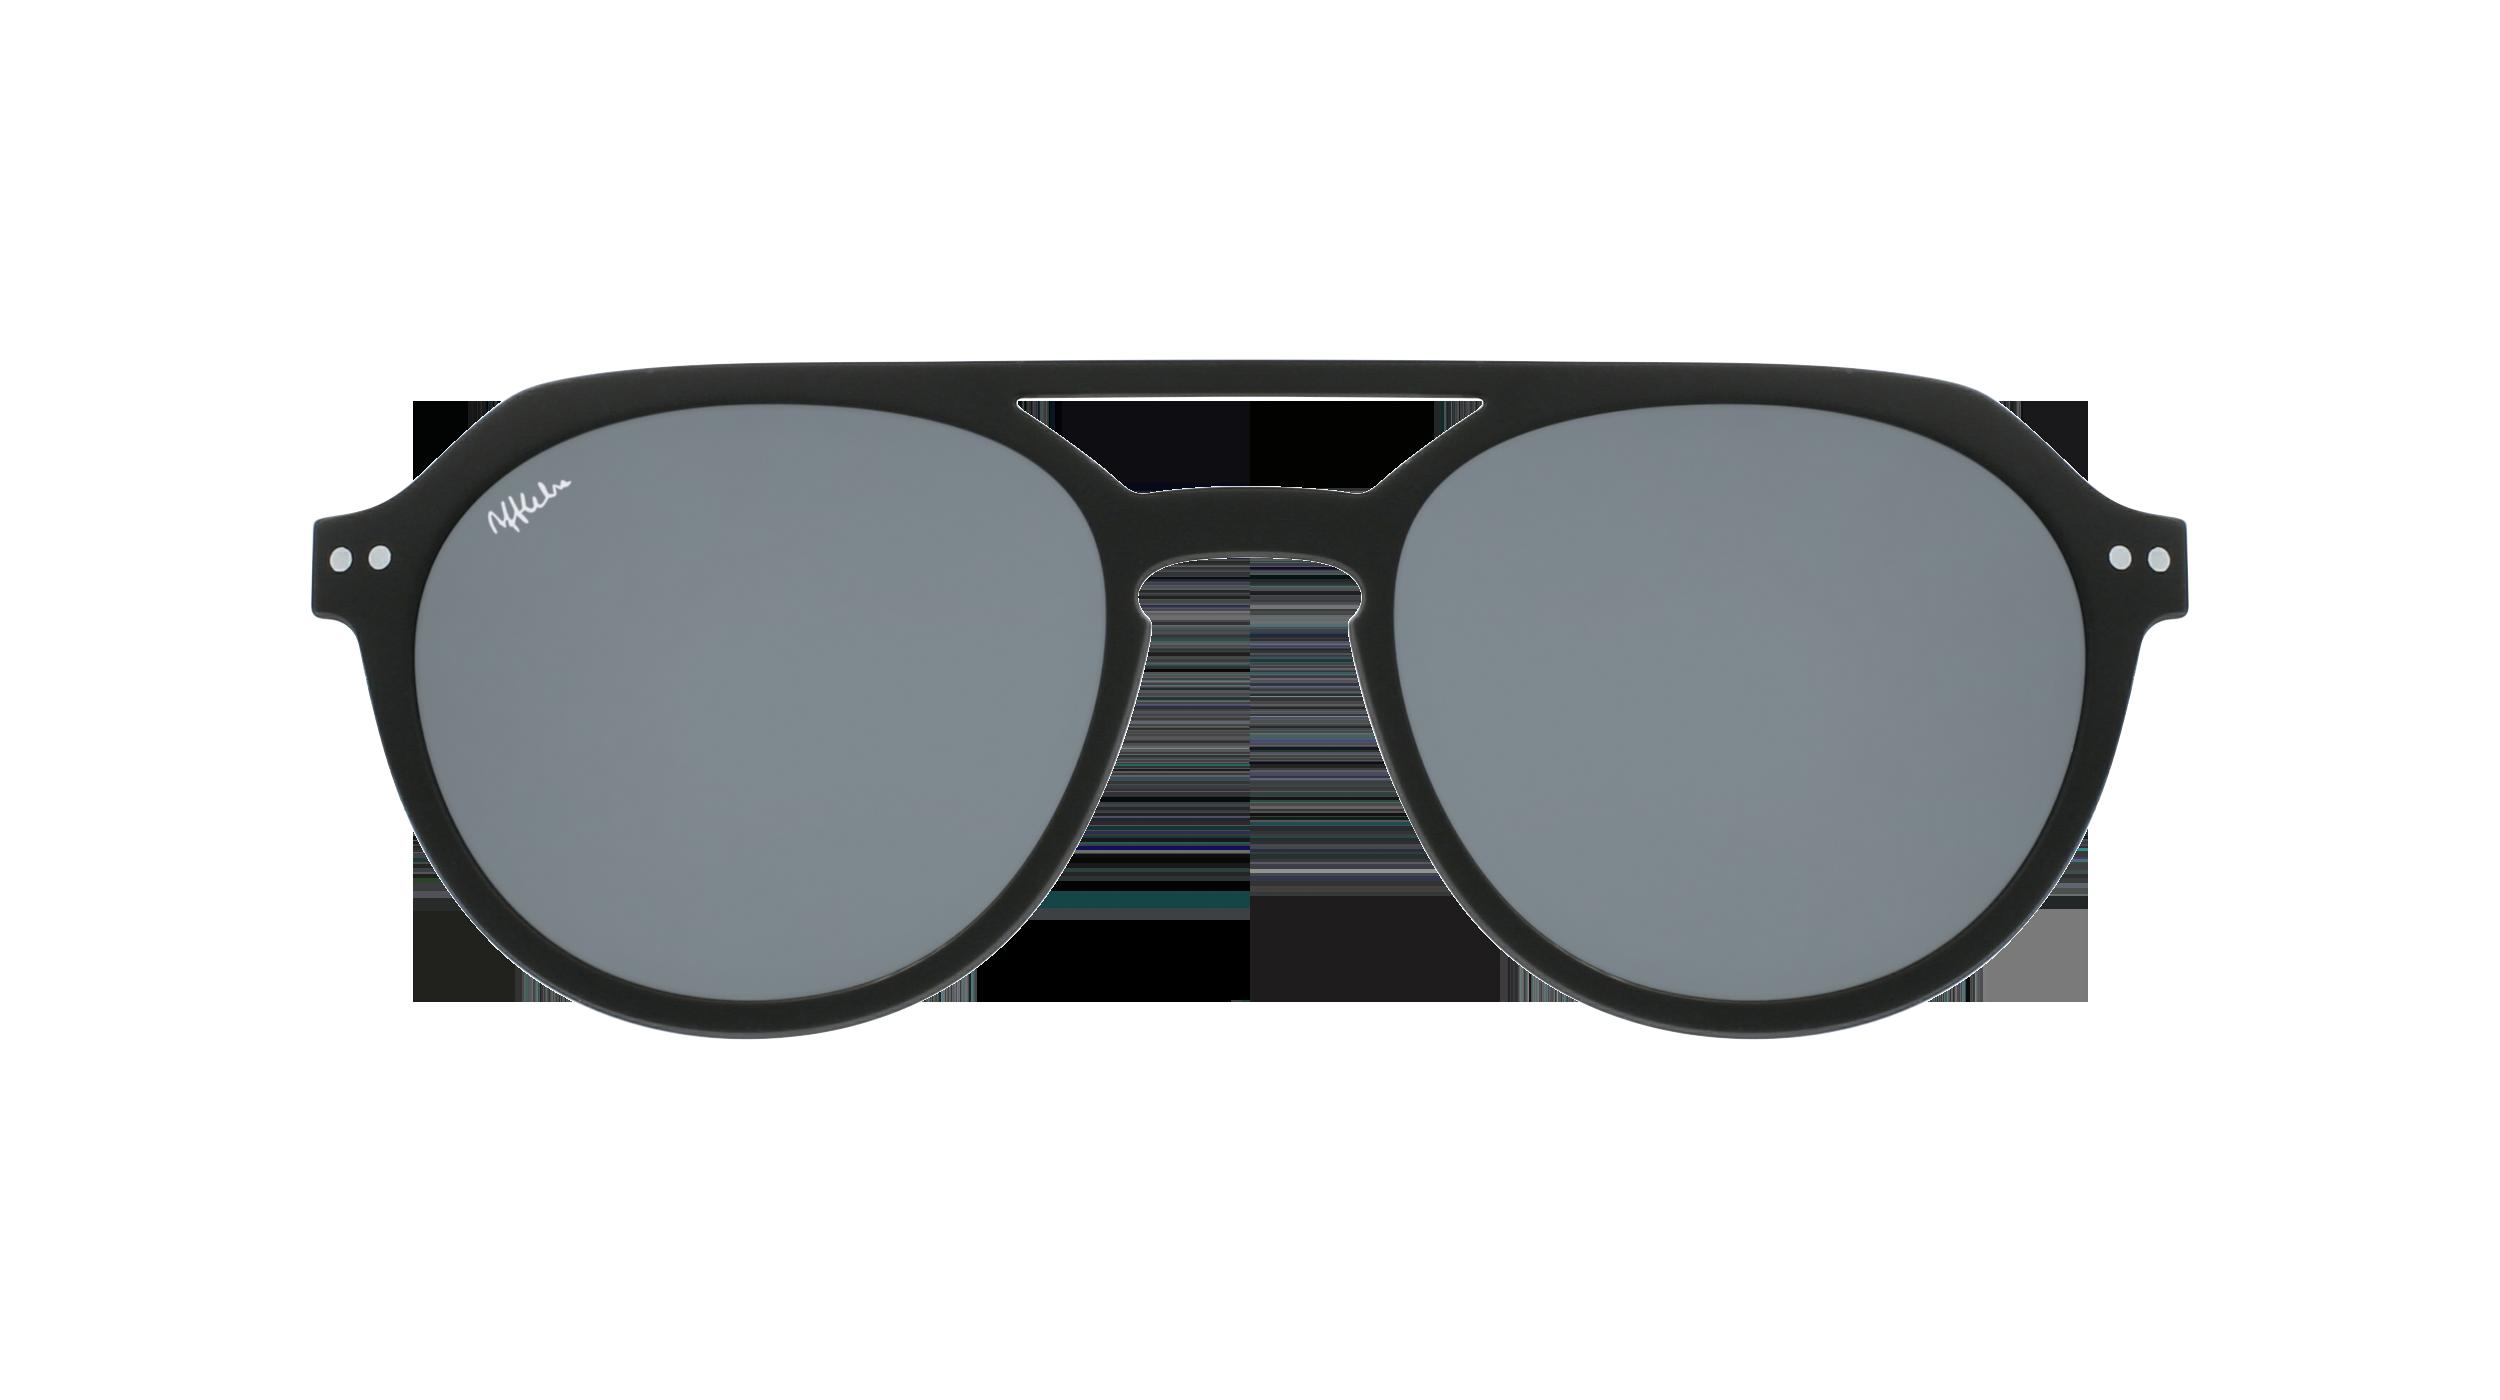 afflelou/france/products/smart_clip/clips_glasses/07630036458815.png